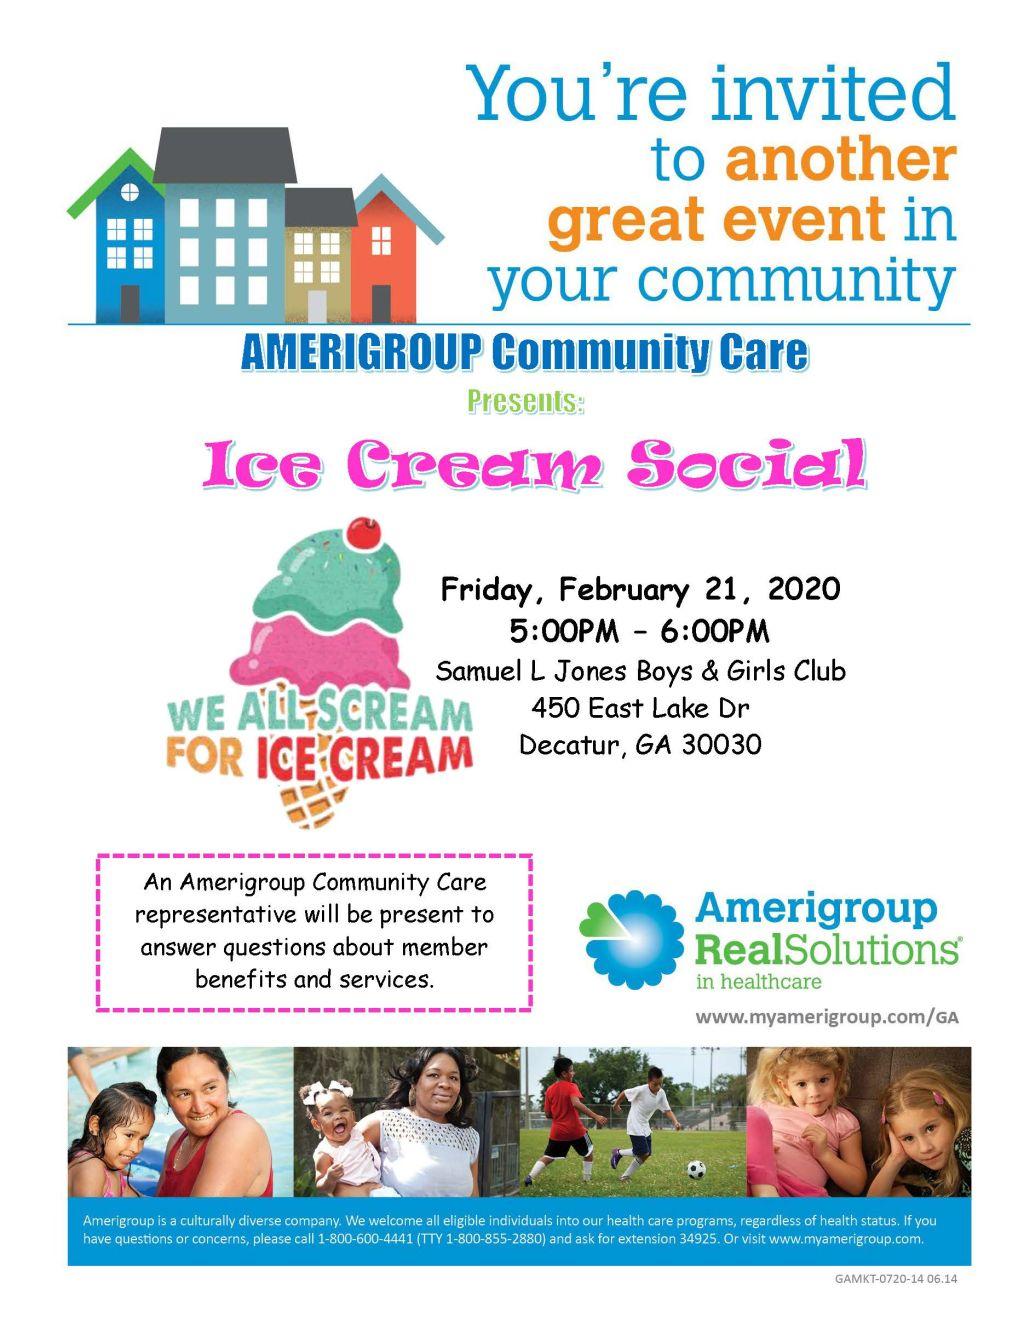 Amerigroup: Ice Cream Social